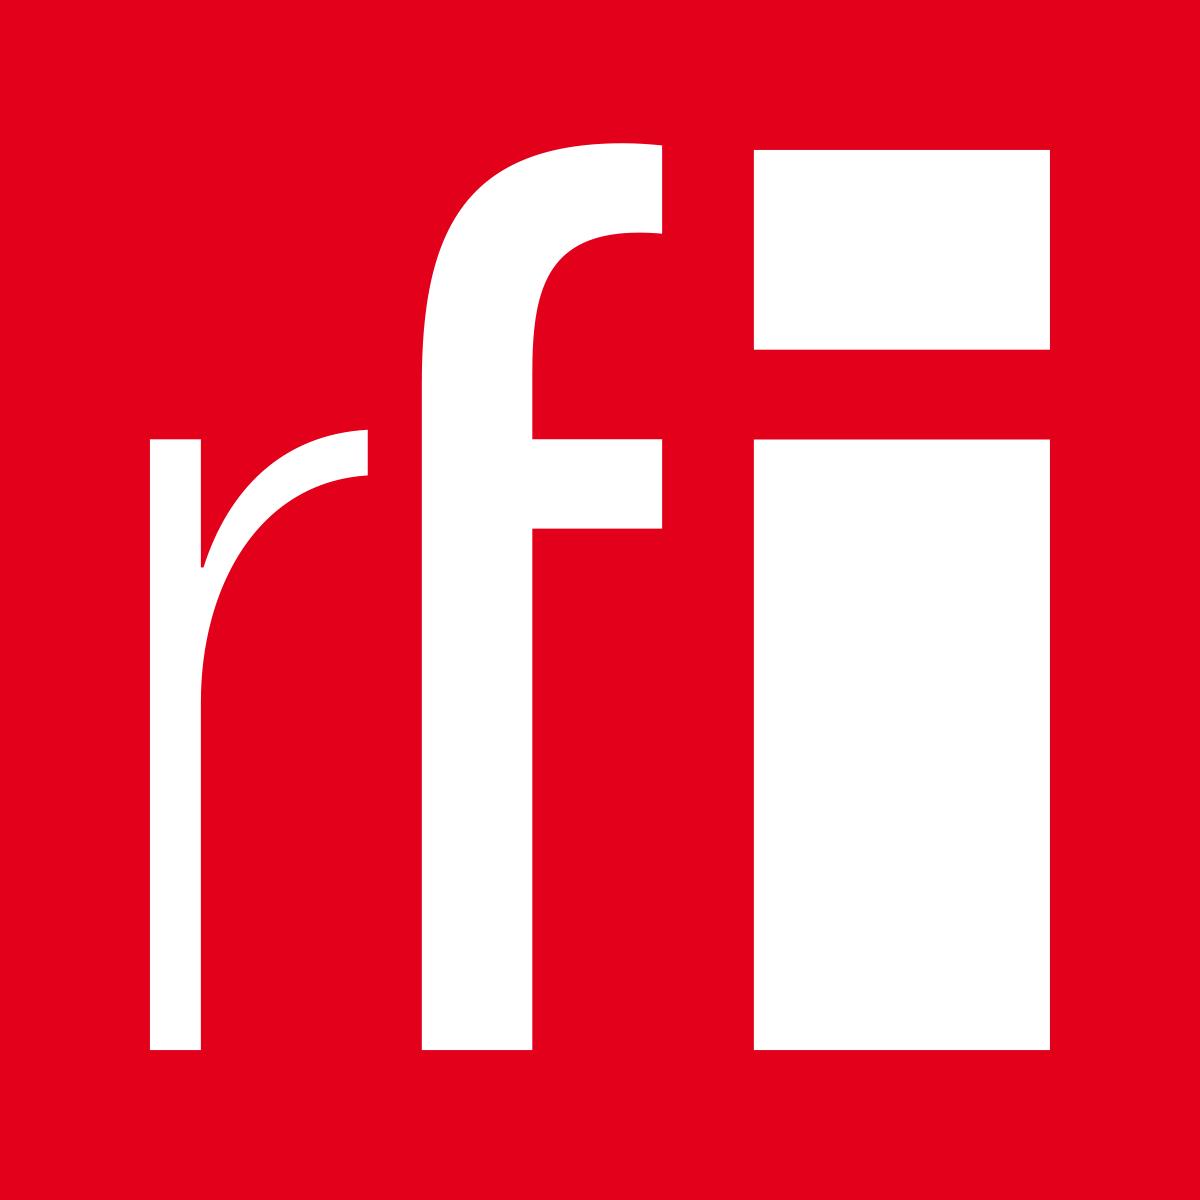 Photo credit: rfi.fr